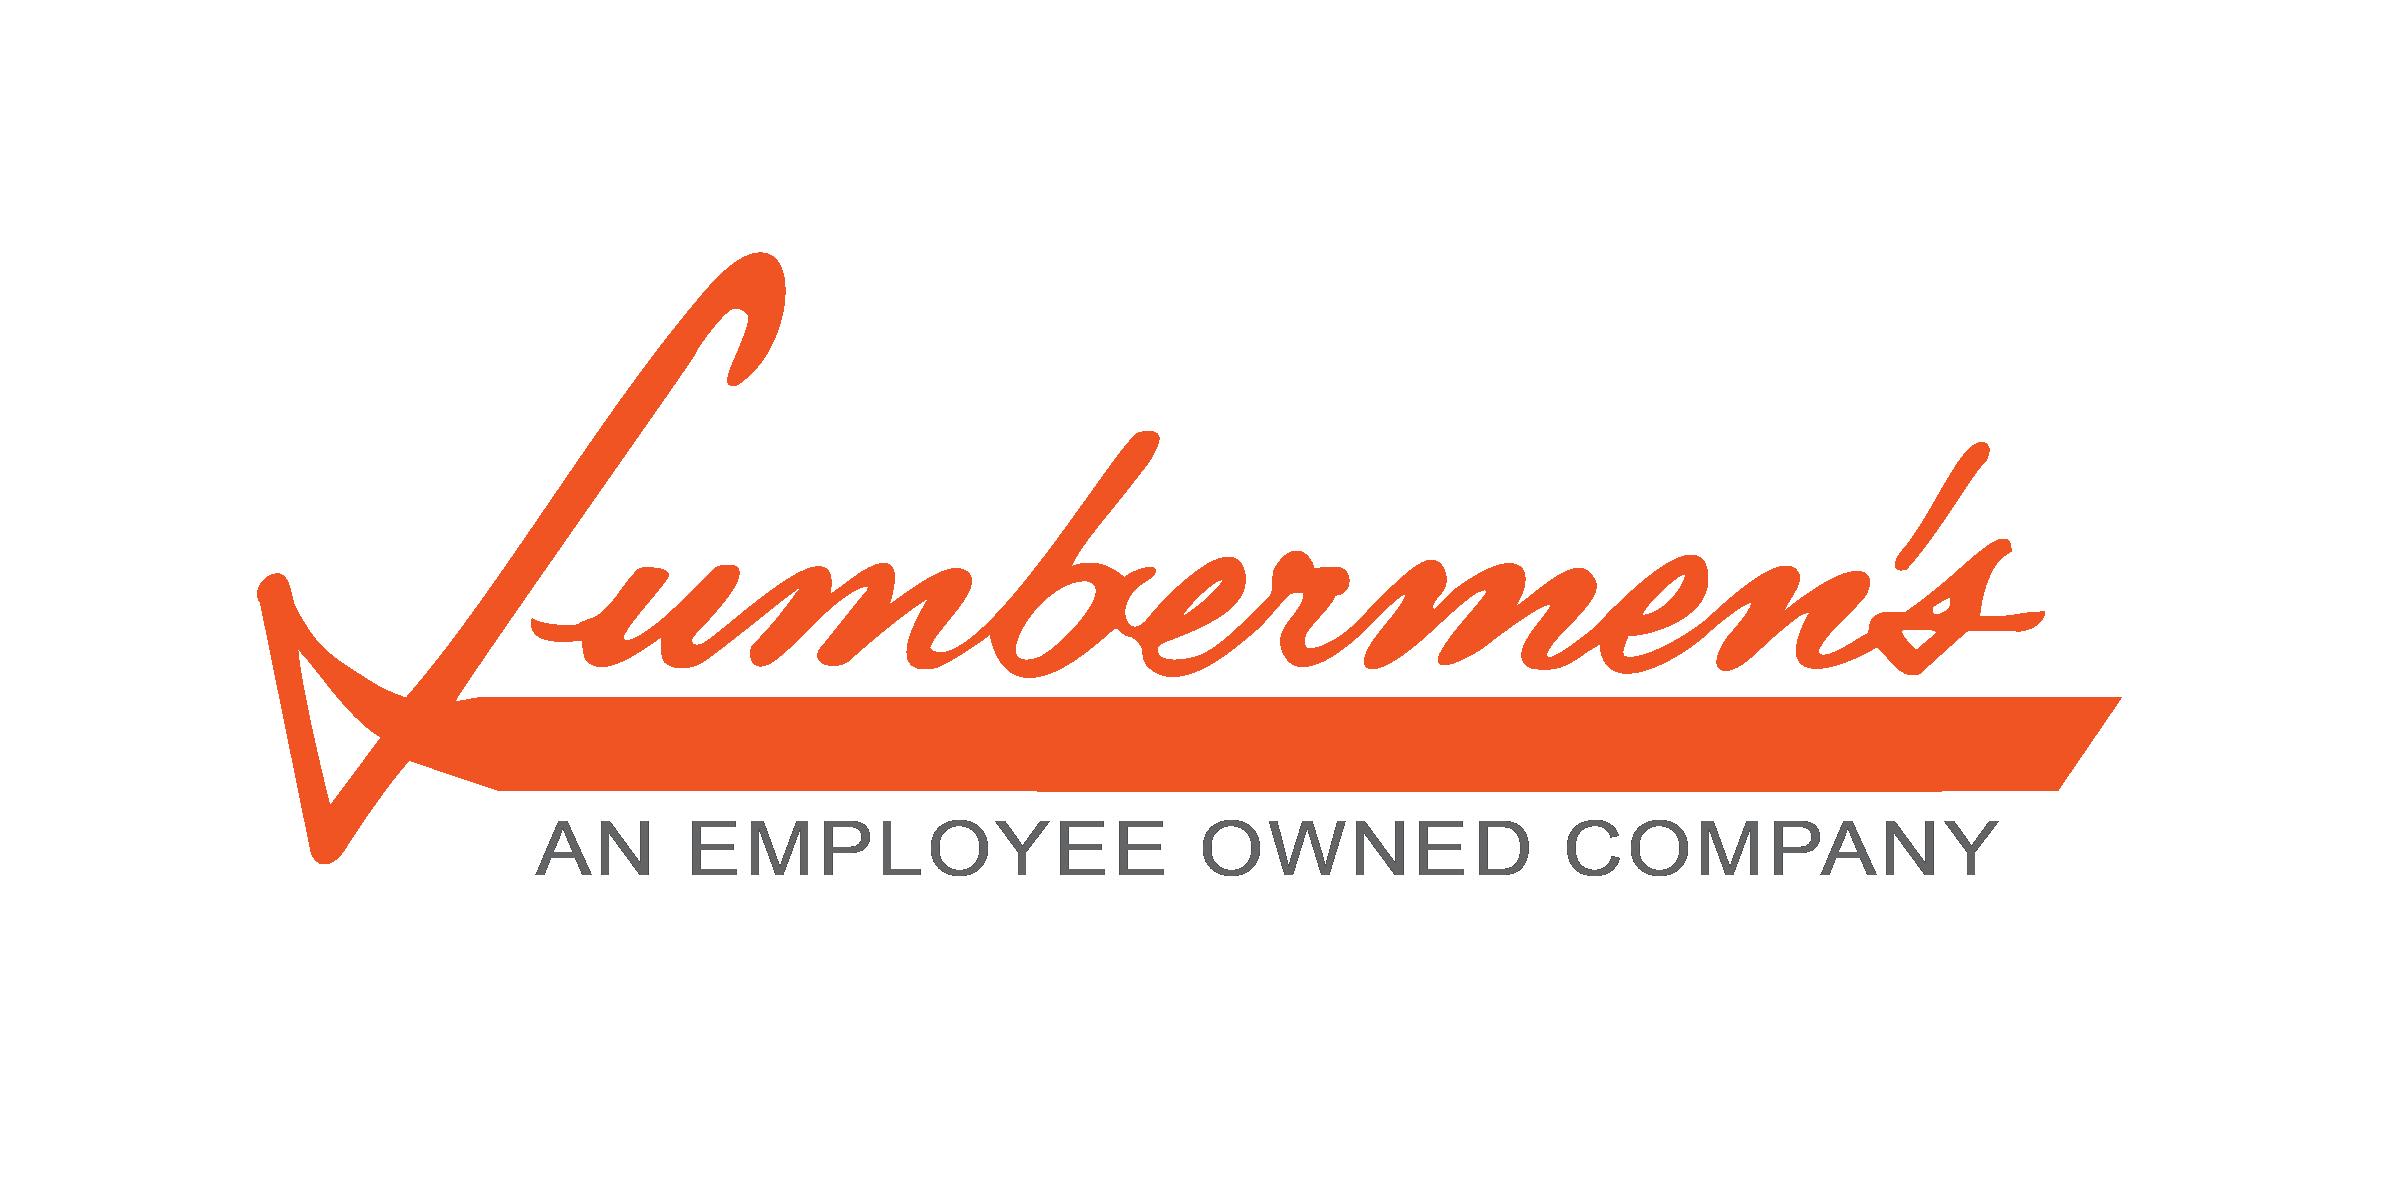 Lumbermens Logo